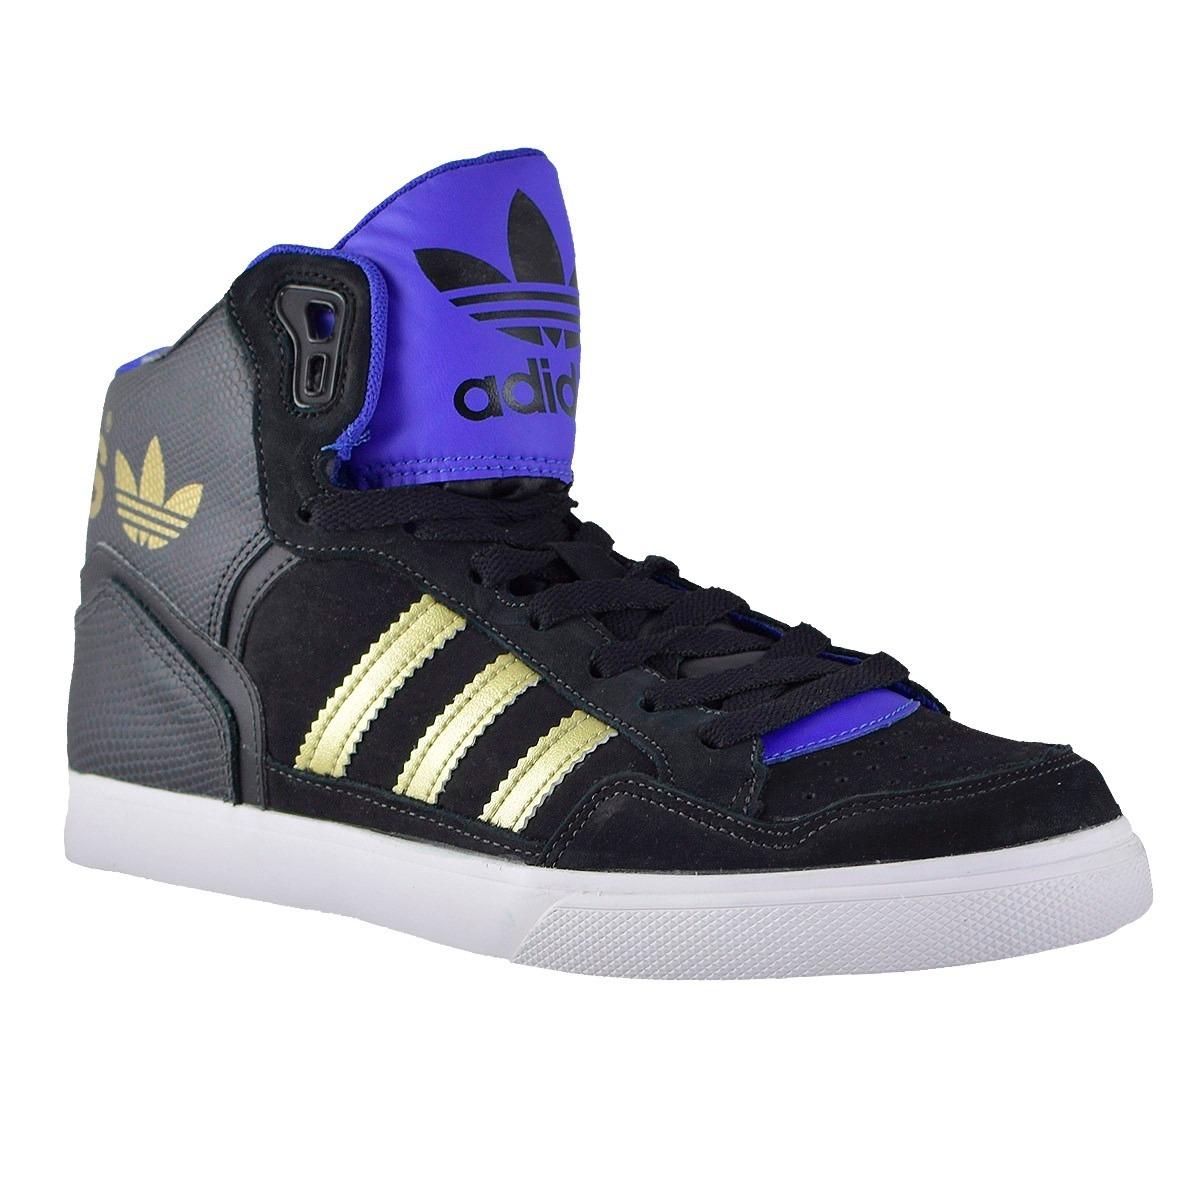 new product f2c97 ca2d2 Mujer Extaball NegroCargando Originals Zoom Zapatillas Adidas CxthQrds